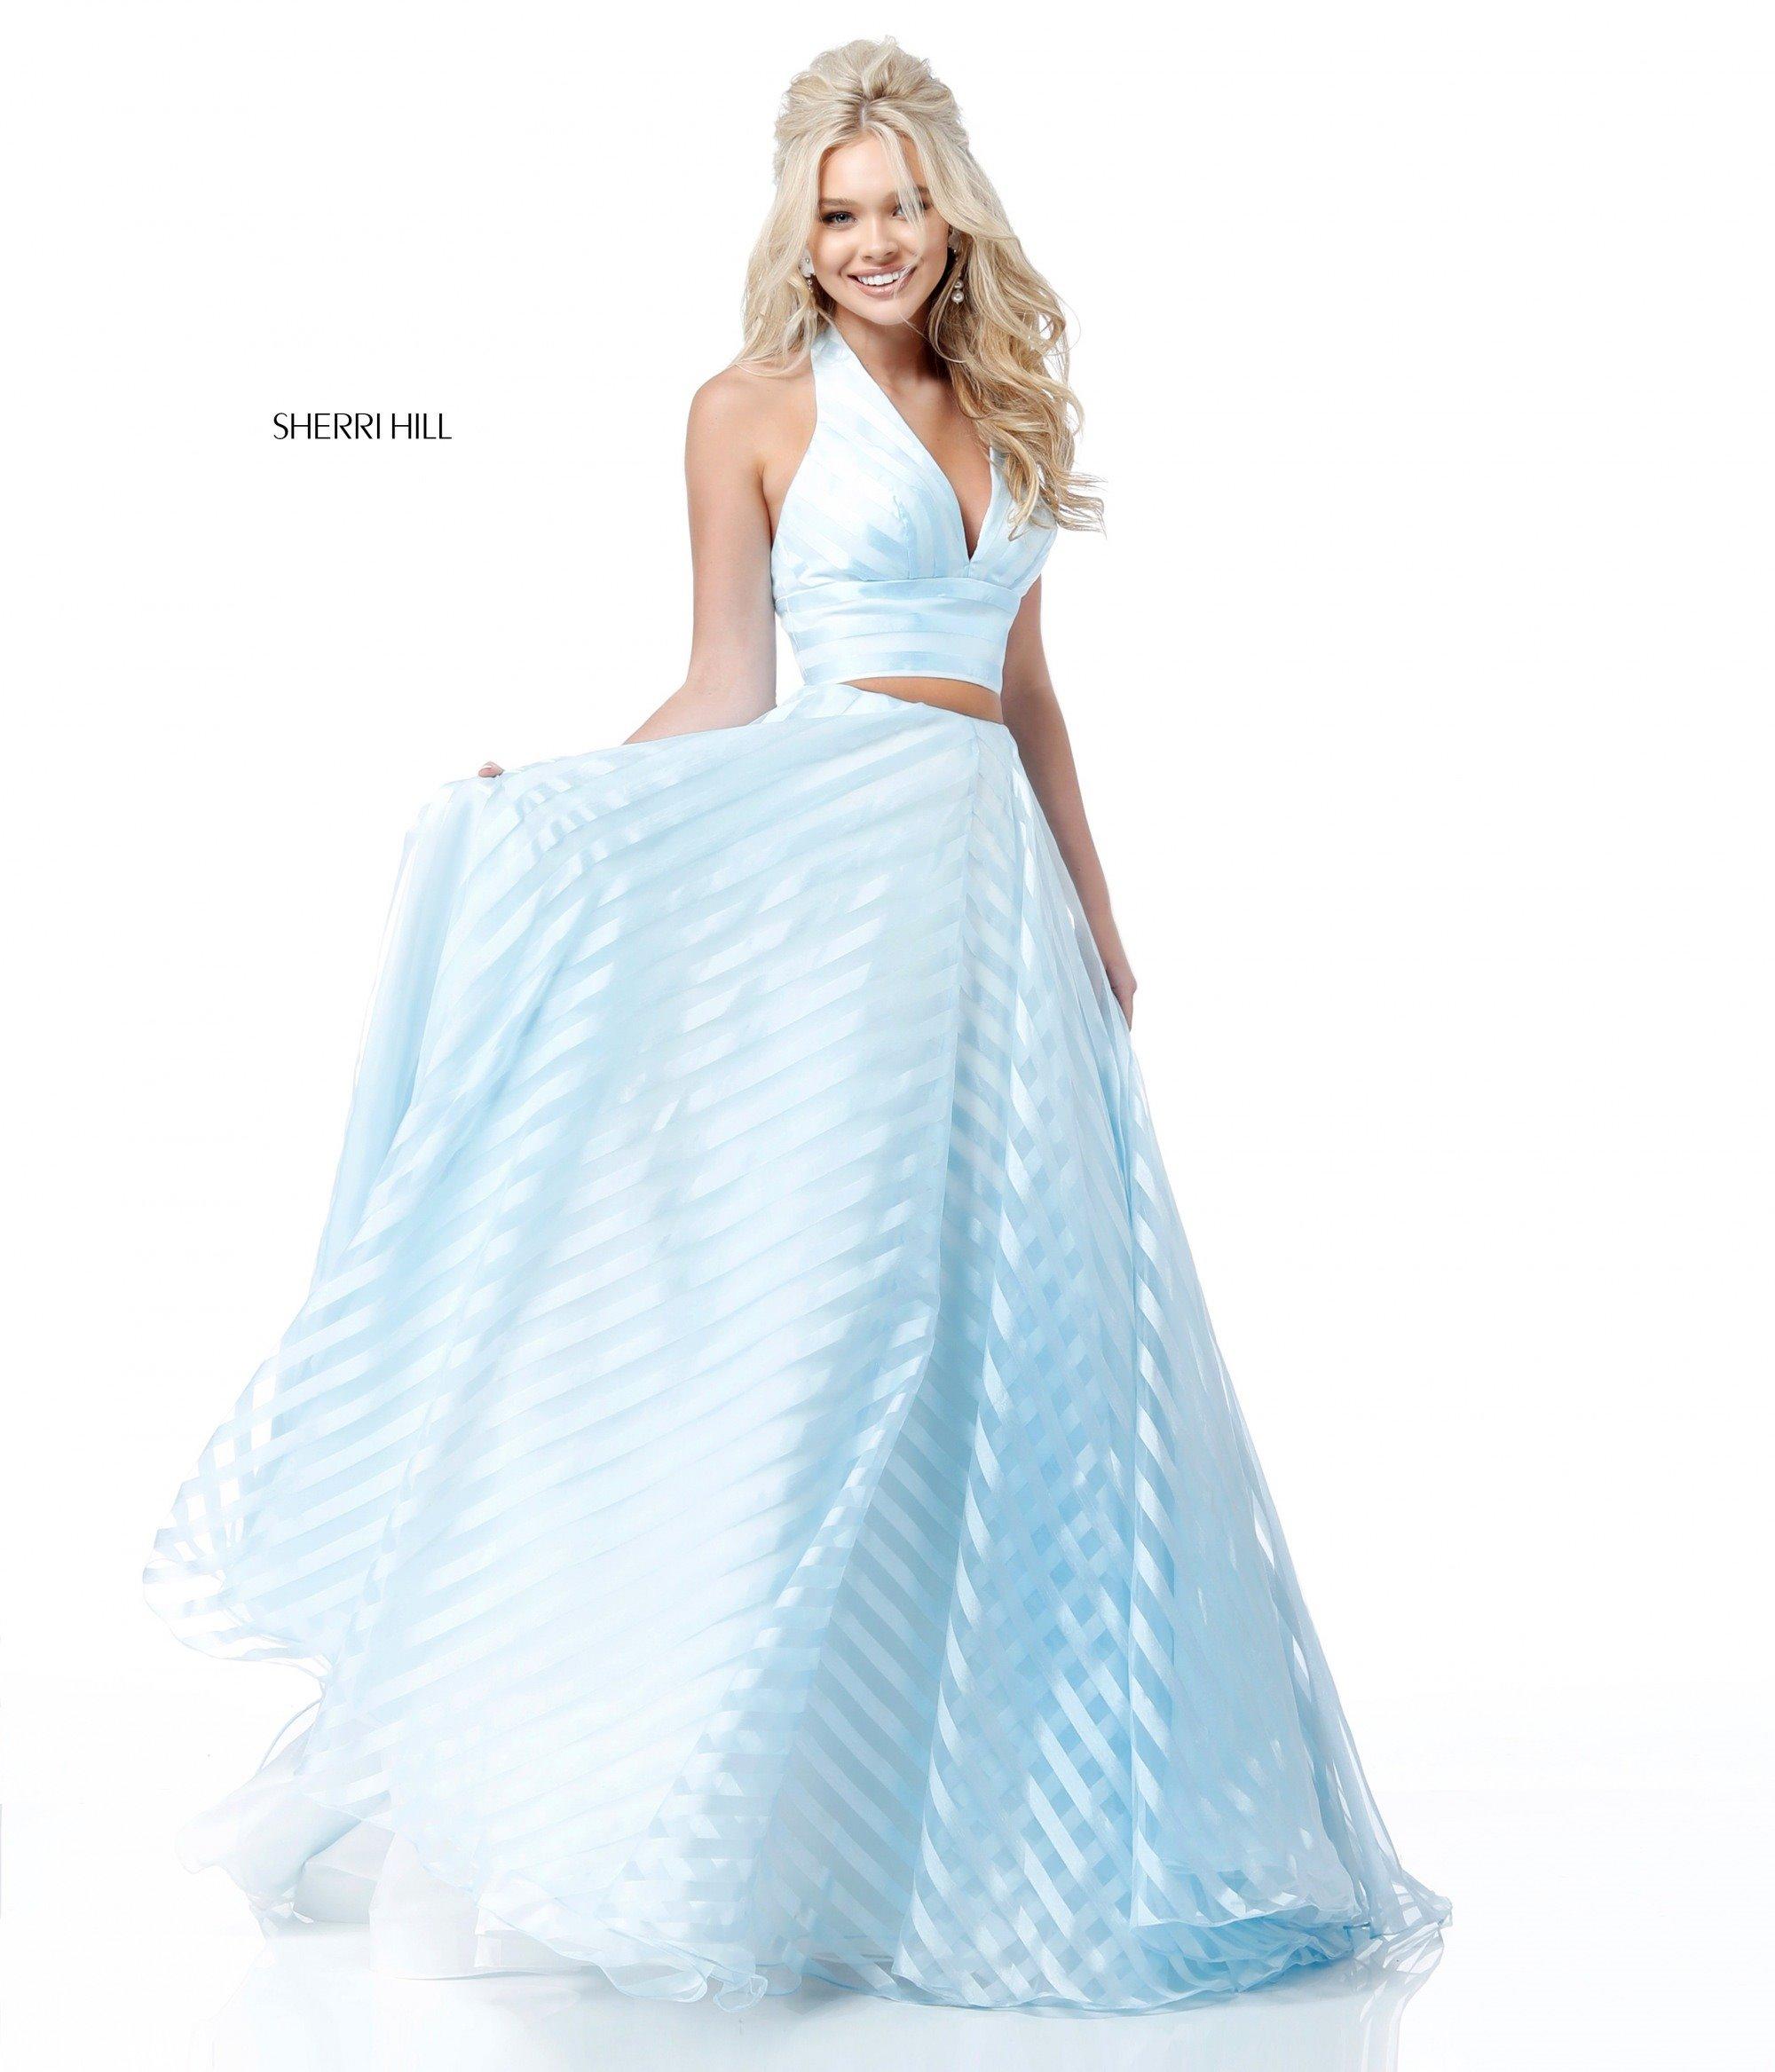 15908bff9b Sherri Hill Spring 2018 Prom Dresses